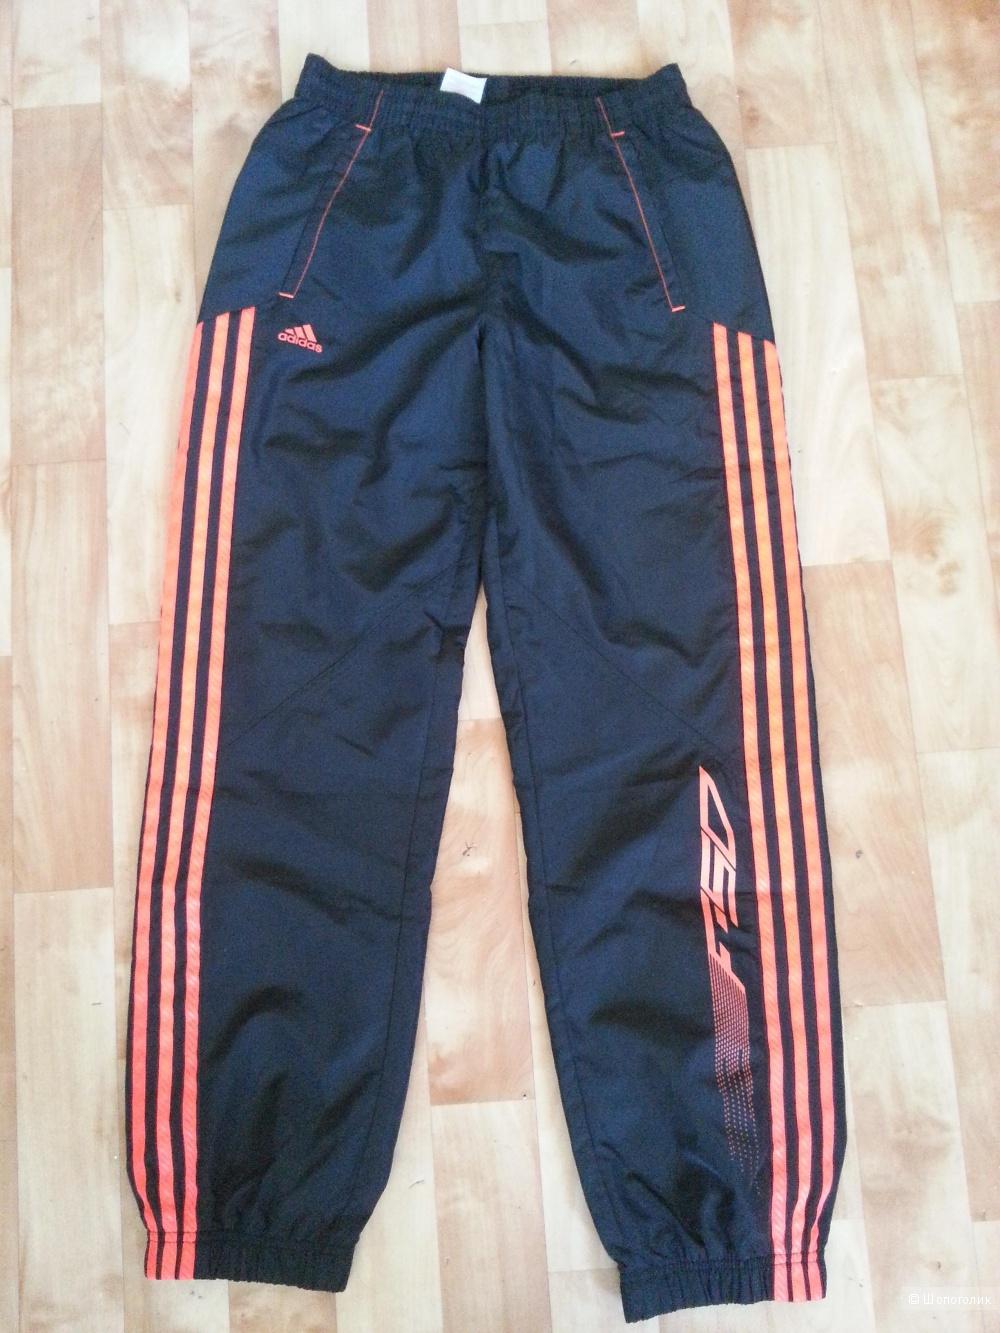 Спортивные штаны Adidas на 12-13лет 1c5b26fdbbb0e